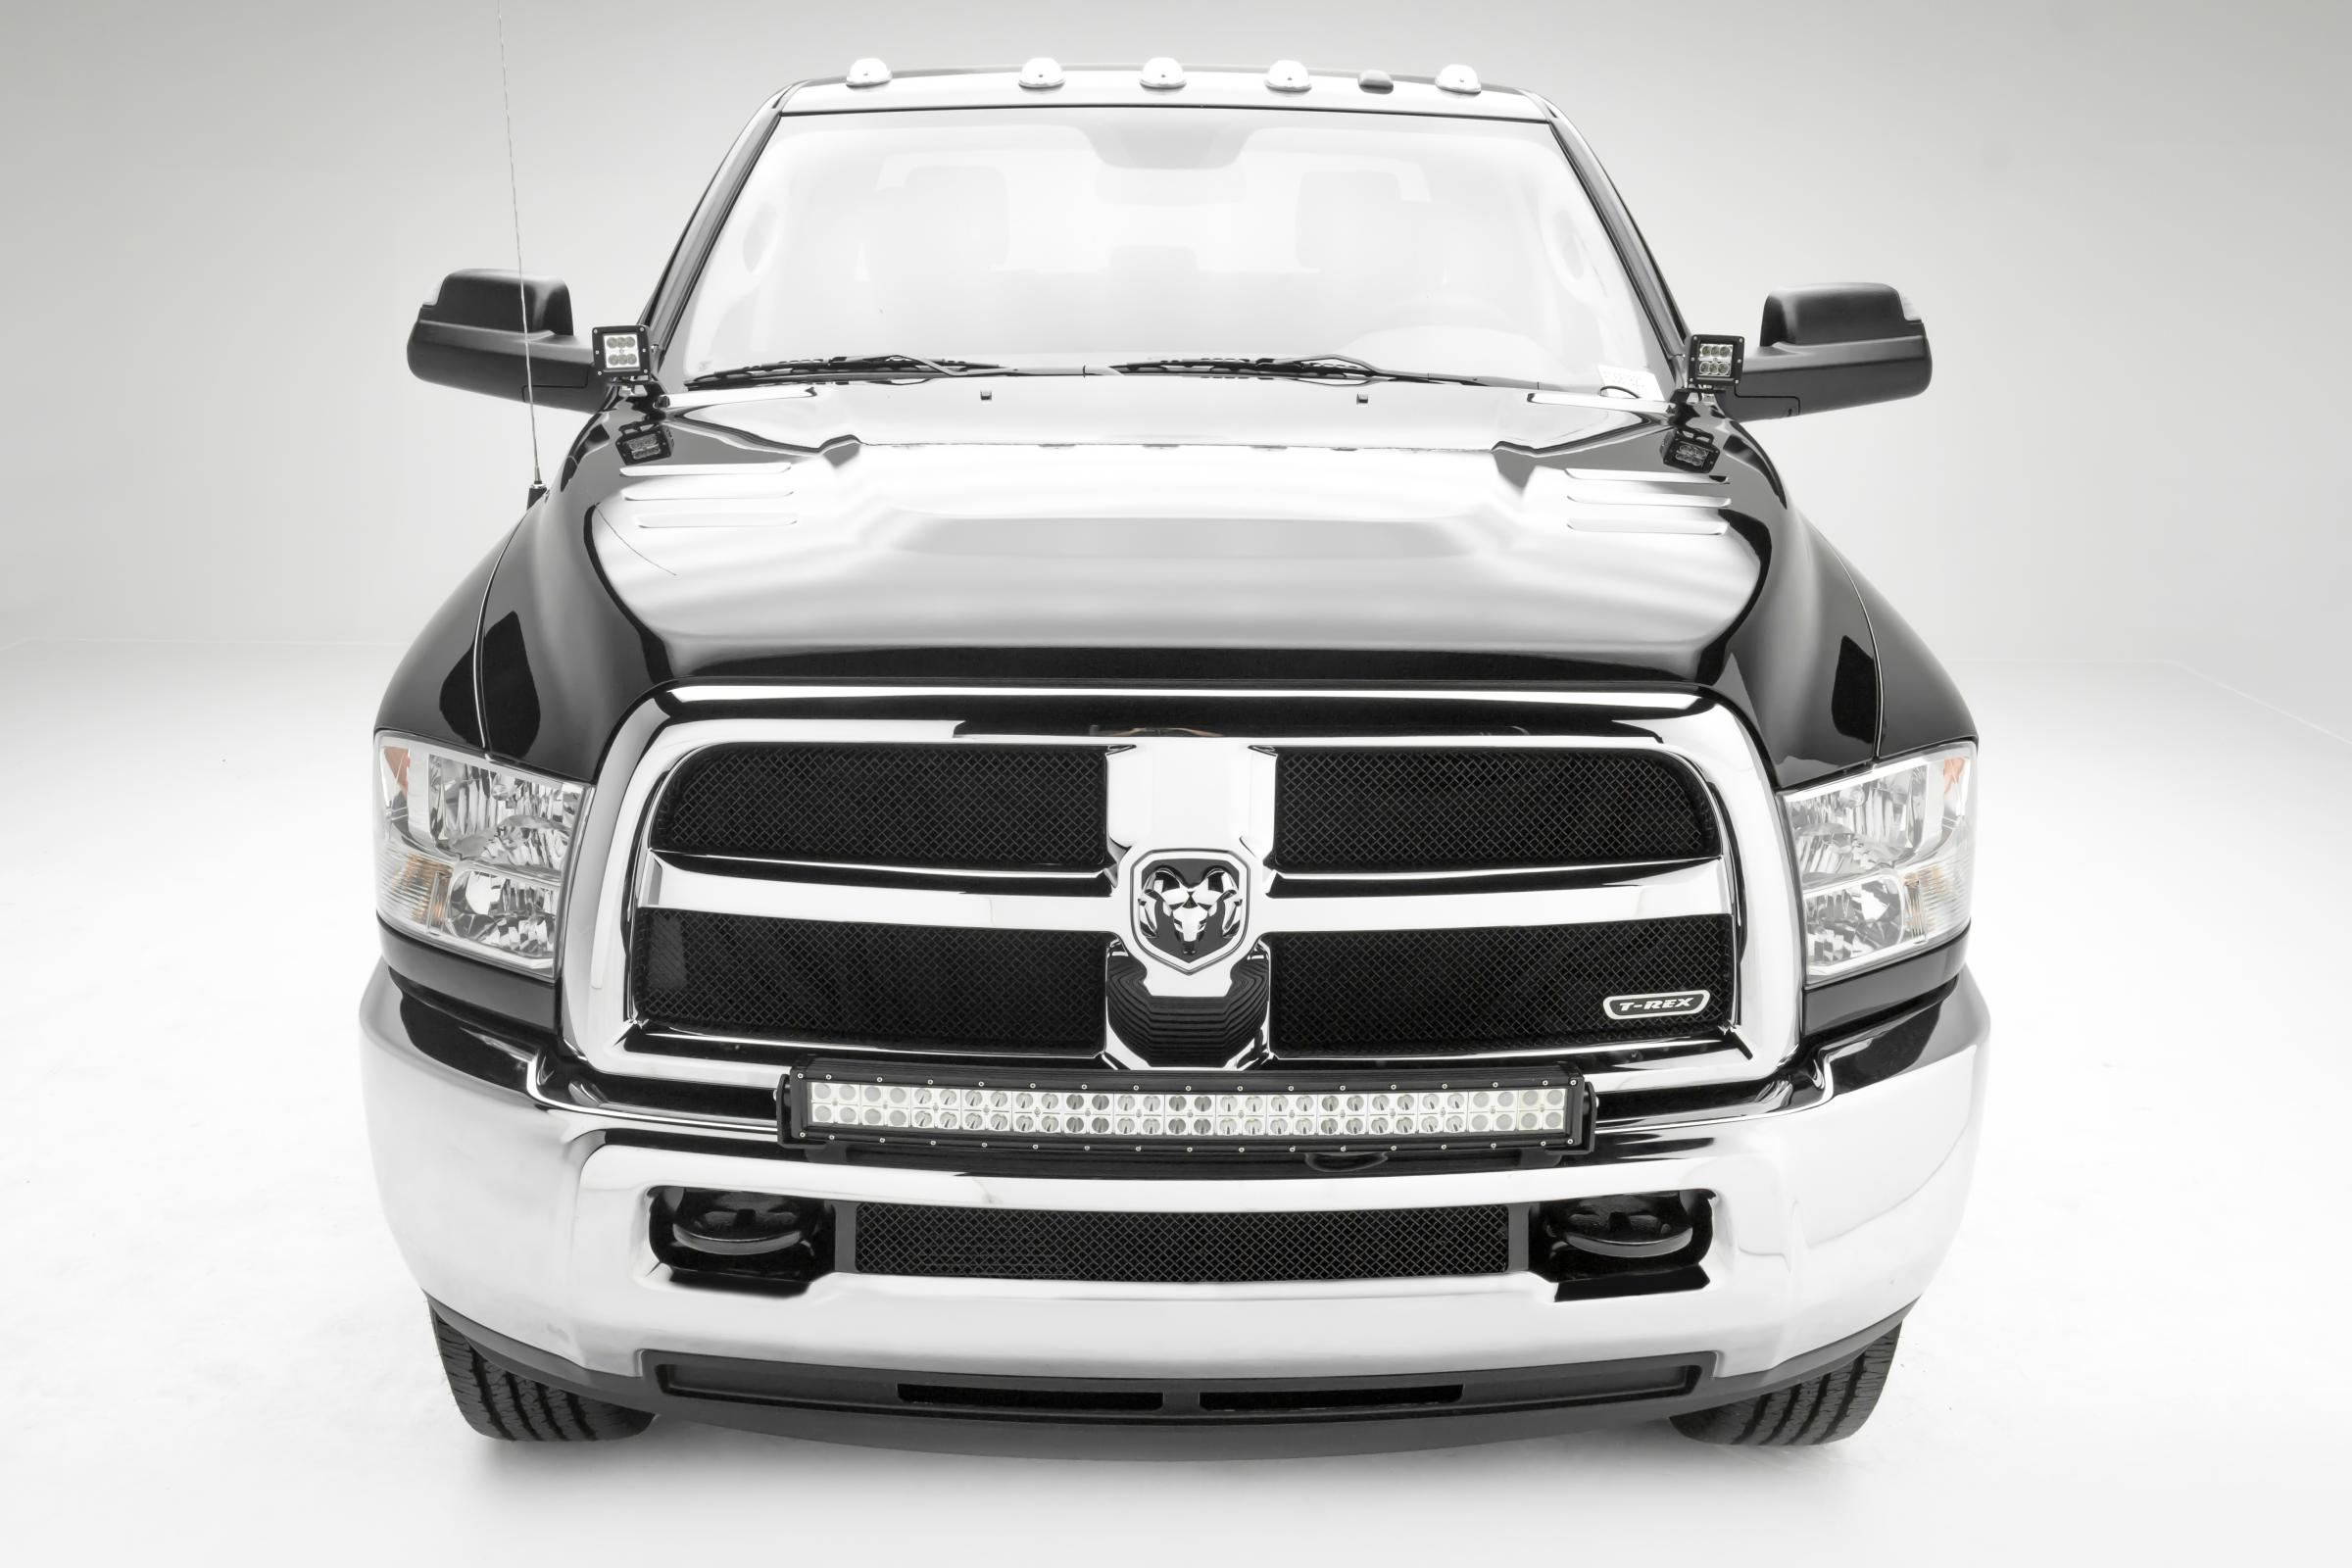 2010 2019 Ram 2500 3500 Front Bumper Top Led Bracket To Mount 1 30 Inch Led Light Bar Pn Z324522 Jeeperz Creeperz